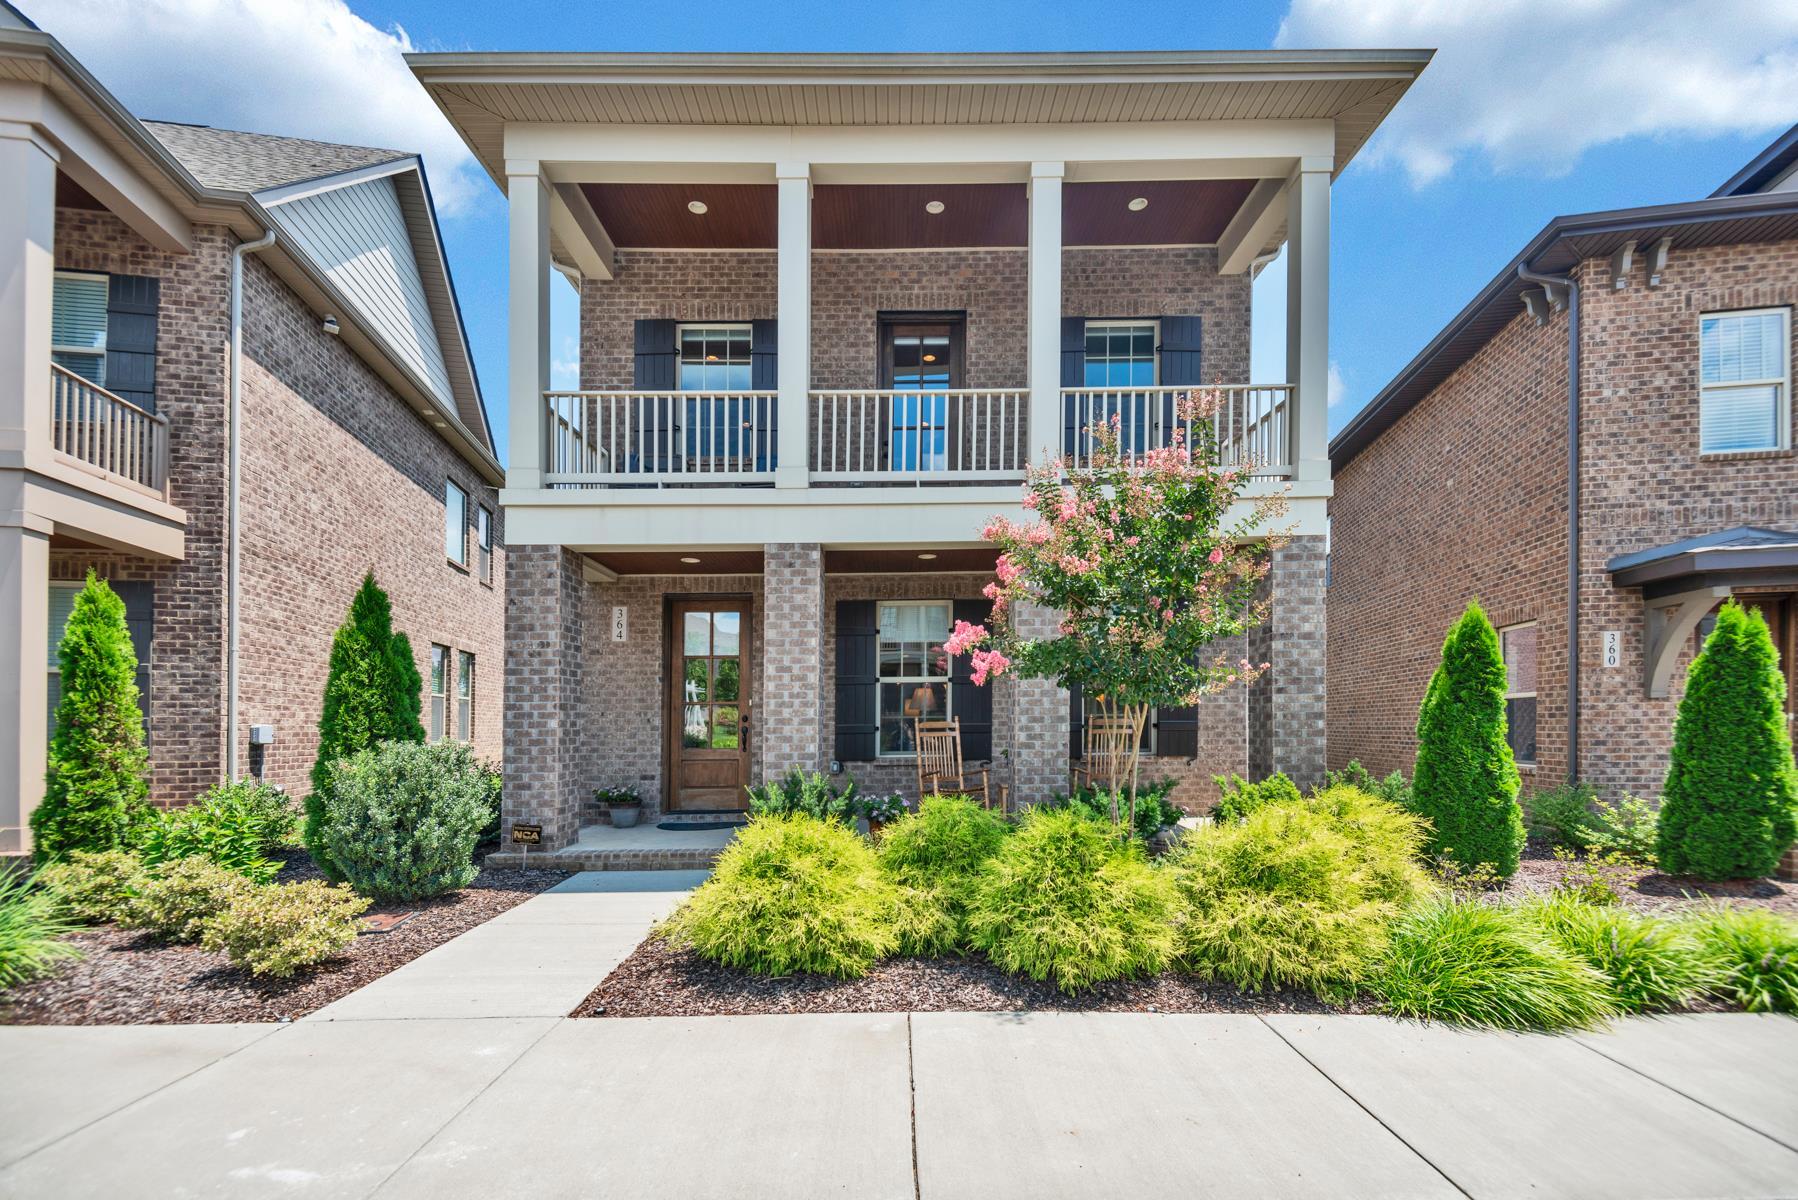 364 Cornelius Way, Hendersonville, TN 37075 - Hendersonville, TN real estate listing